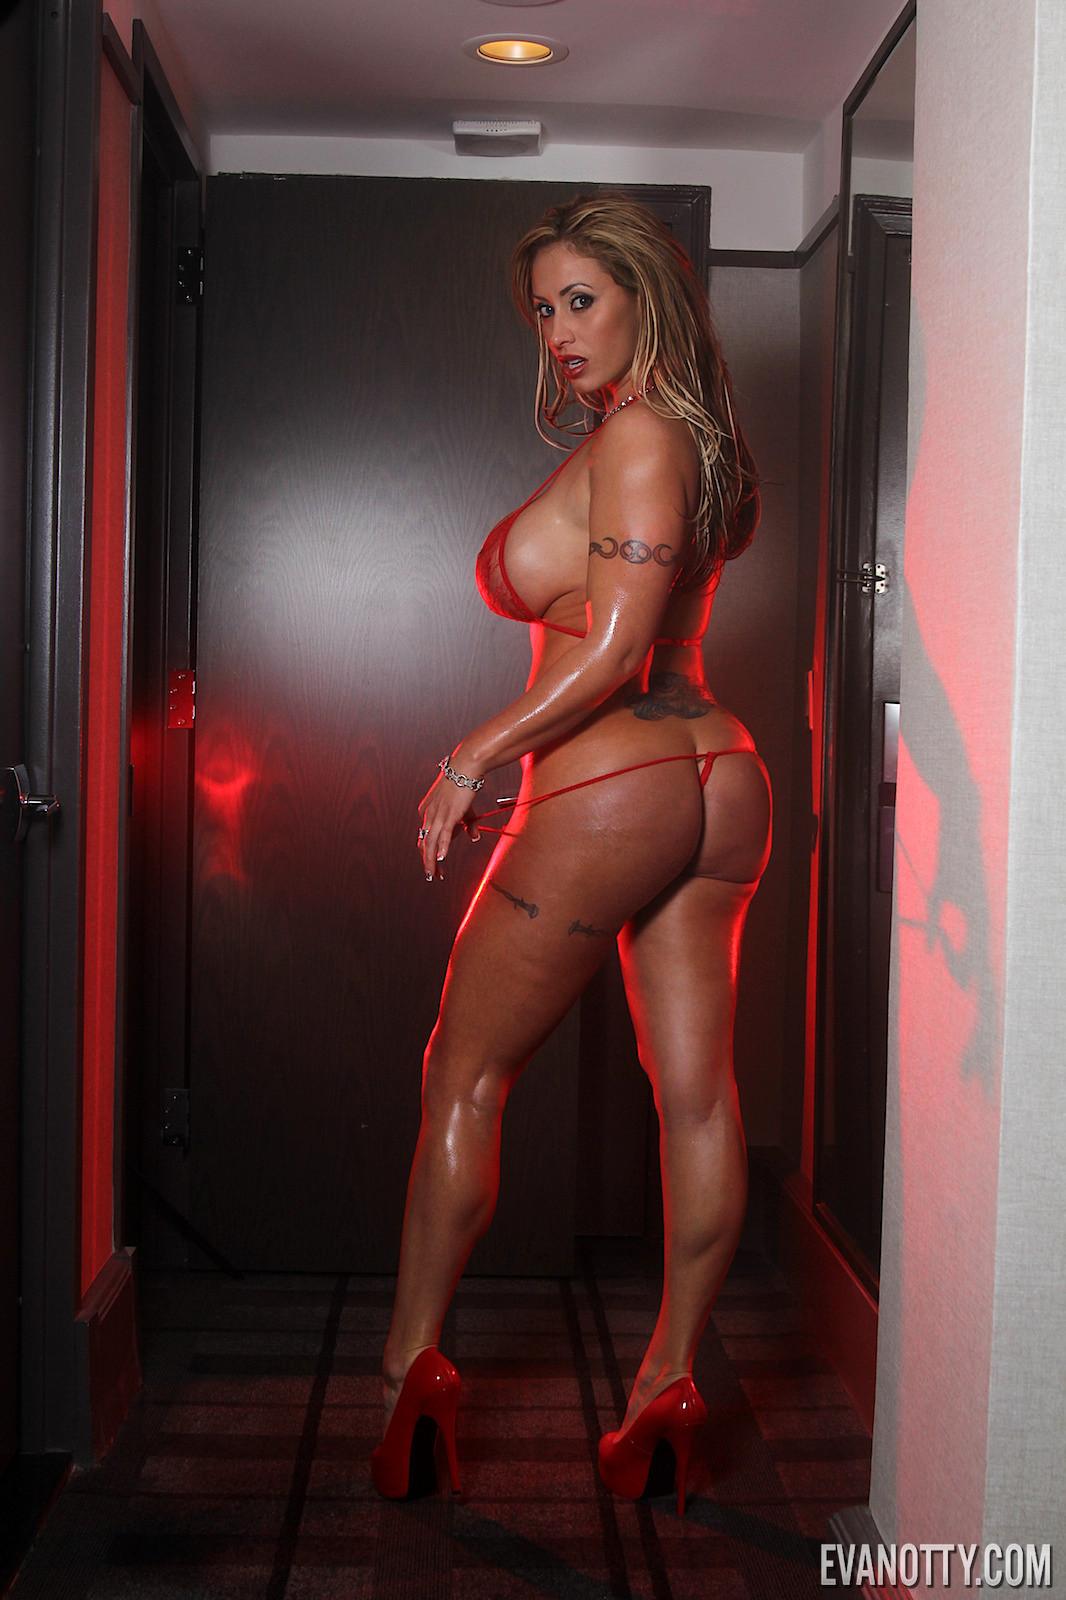 bikini porn sex